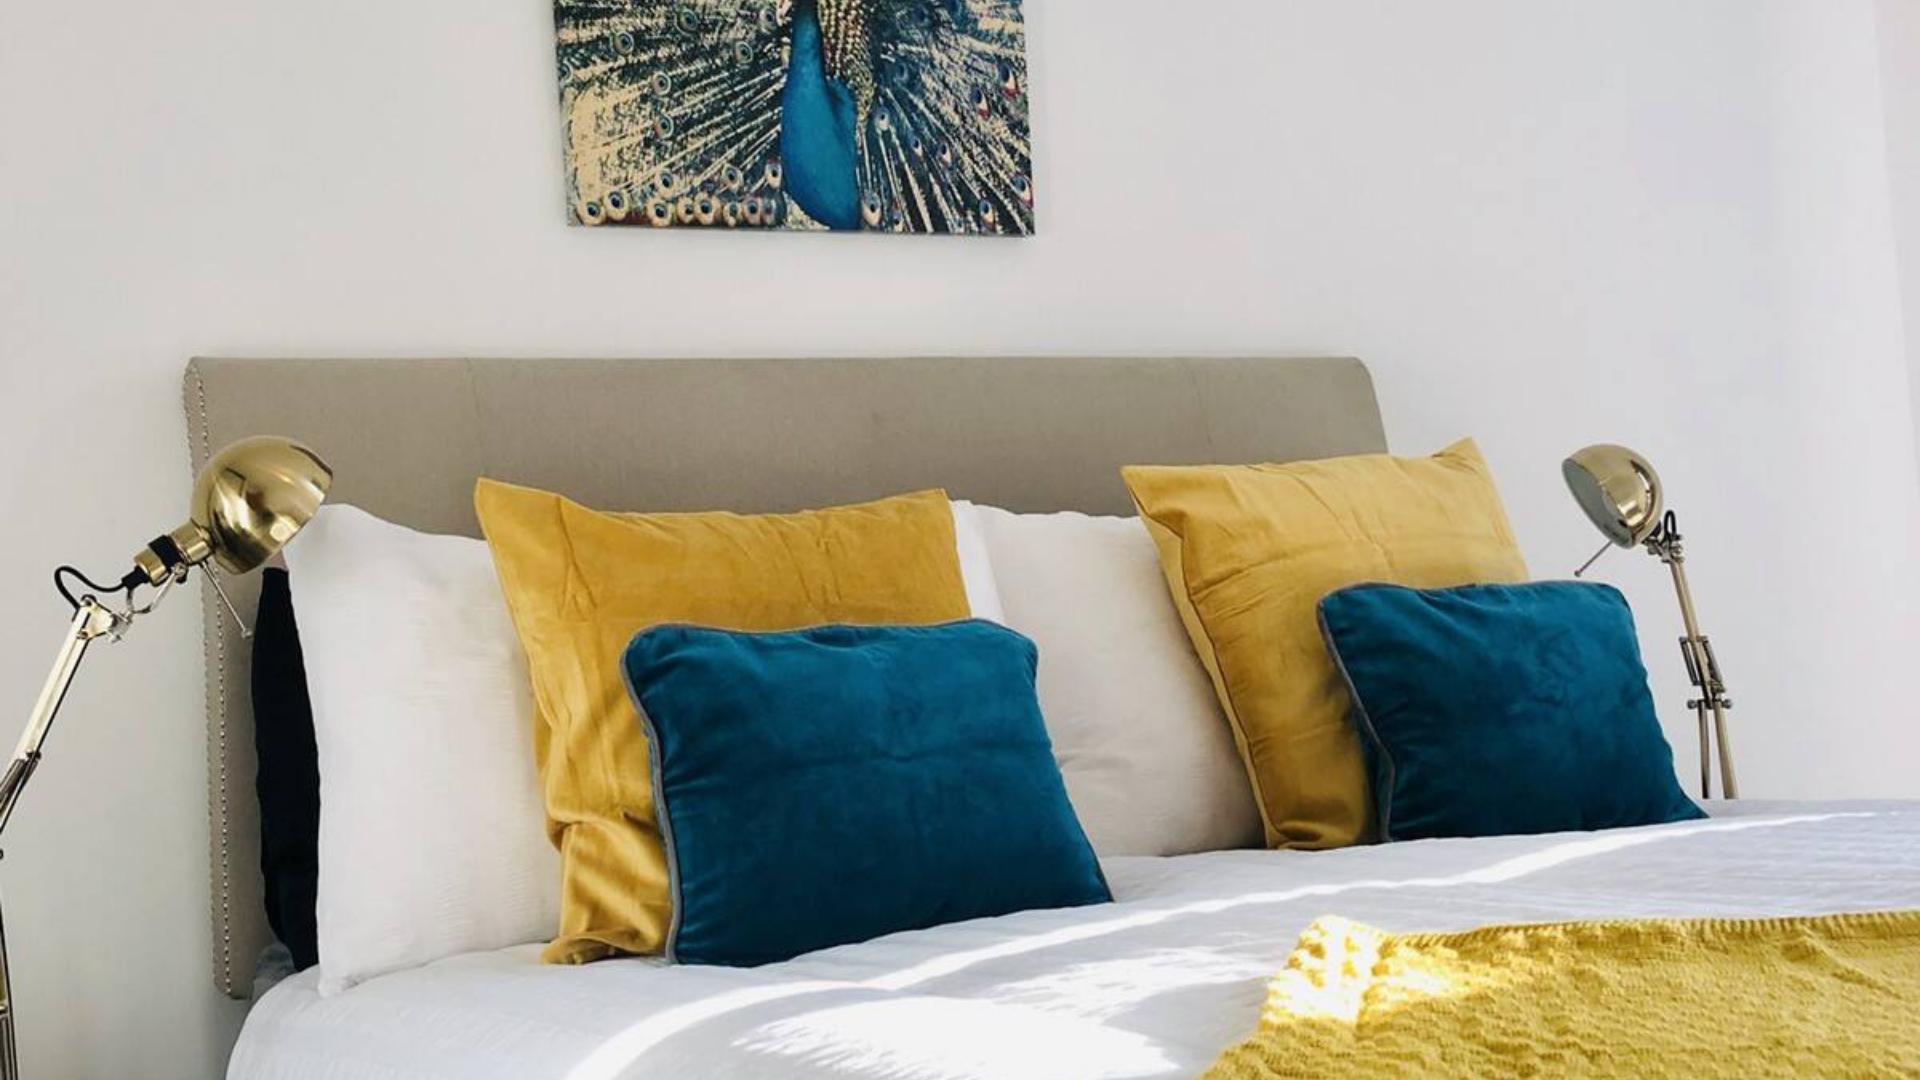 Bedding at Quarter Blonk Street Apartments, Centre, Sheffield - Citybase Apartments